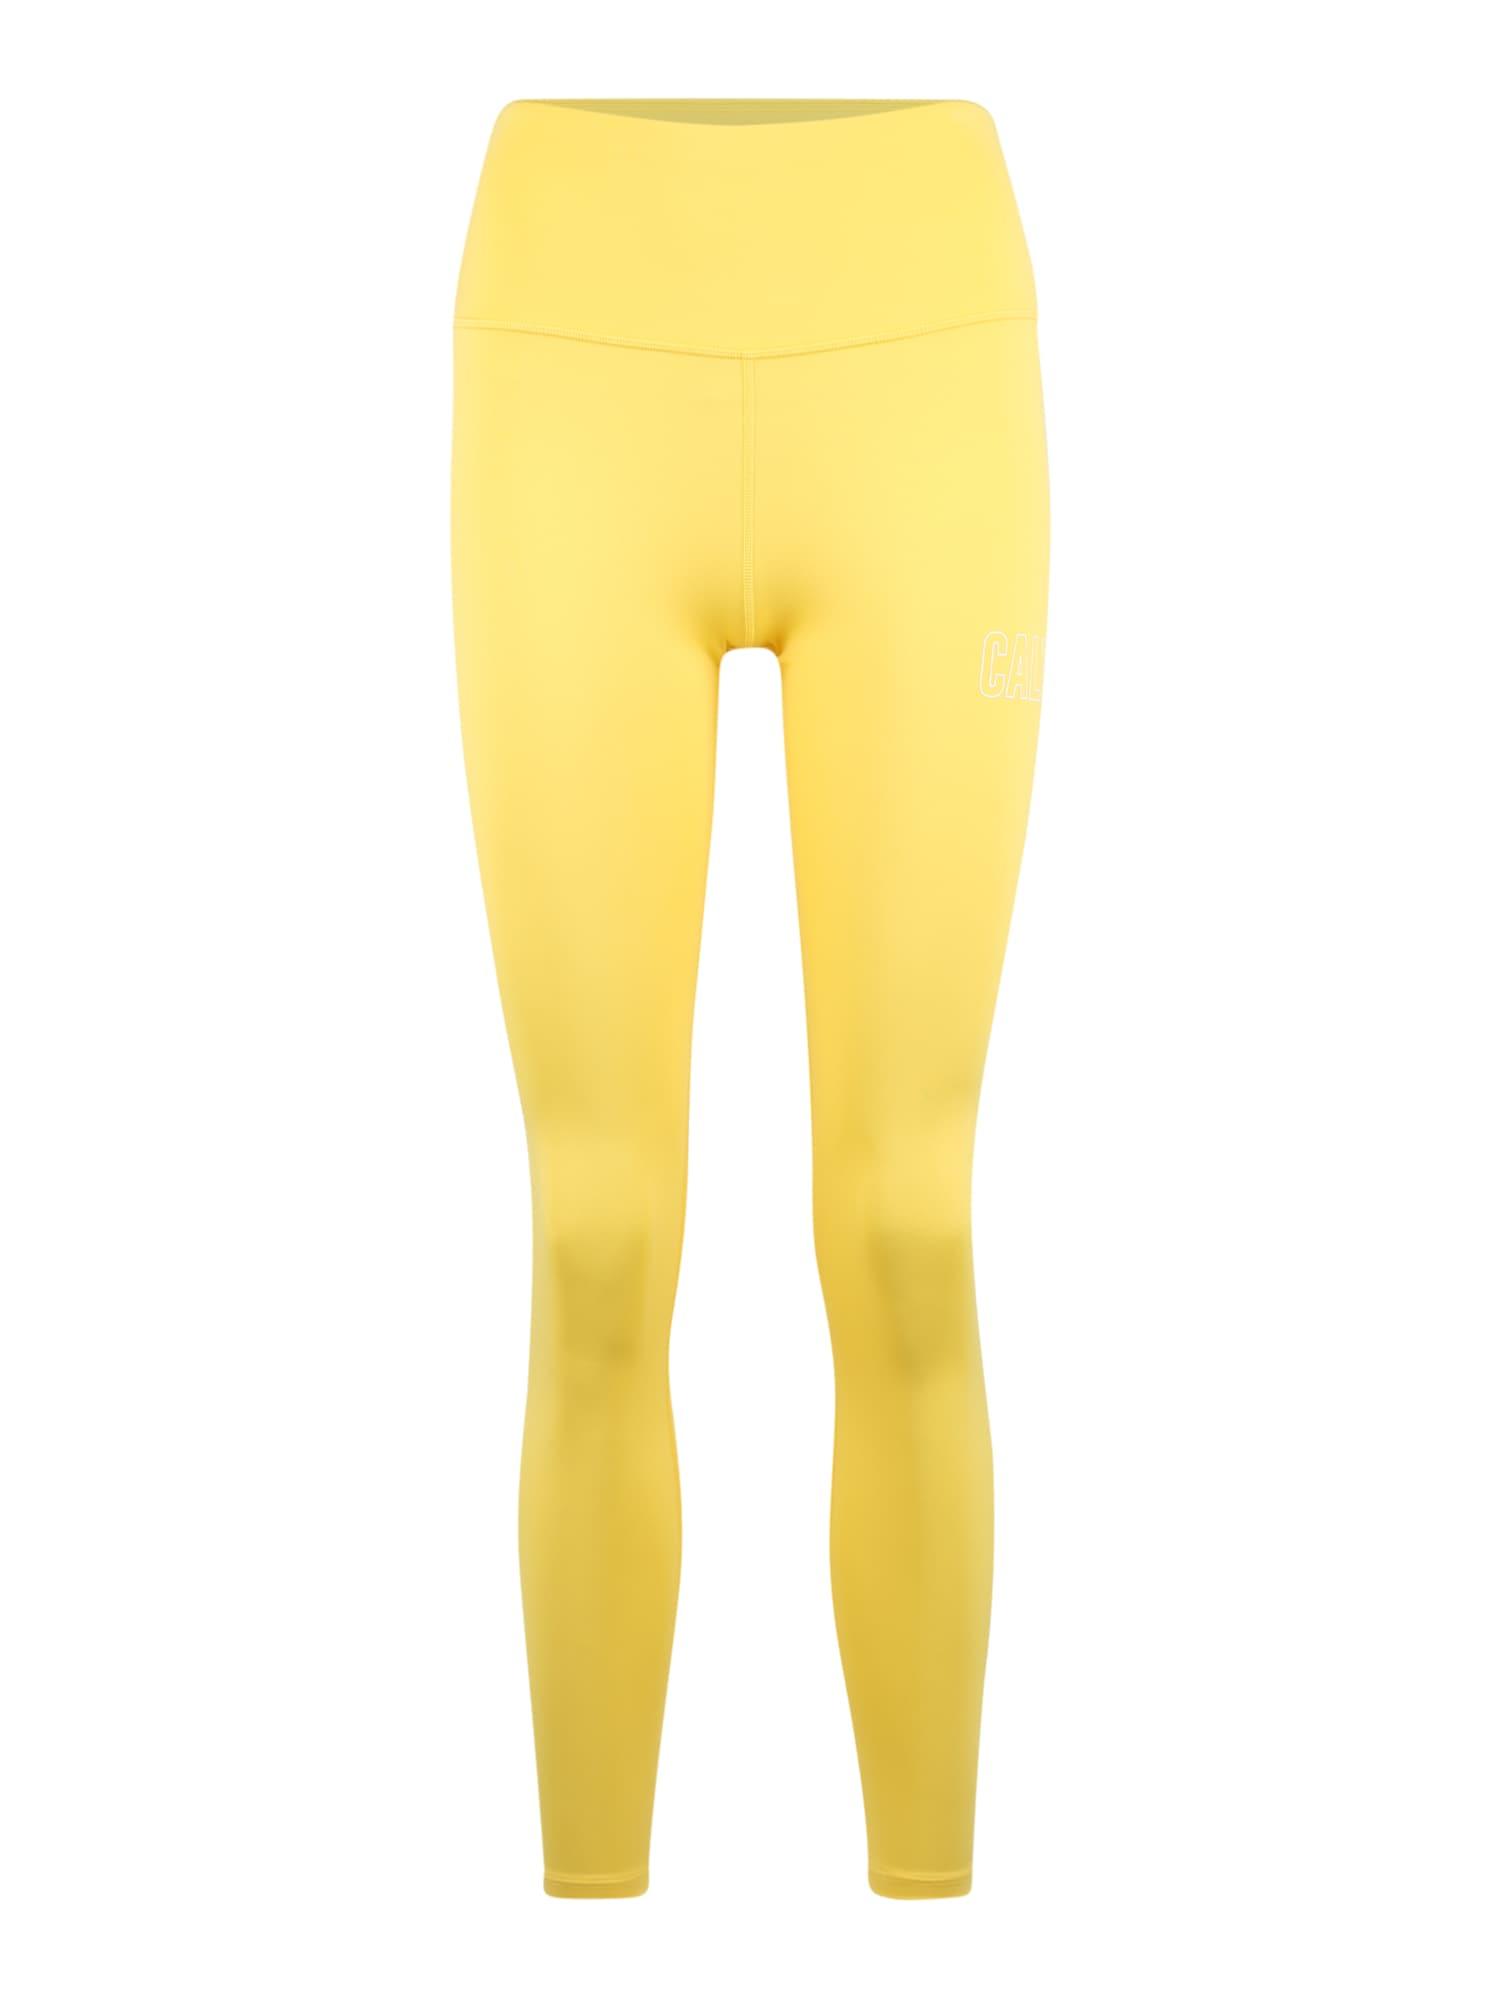 Calvin Klein Performance Sportinės kelnės 'FULL LENGTH TIGHT' geltona